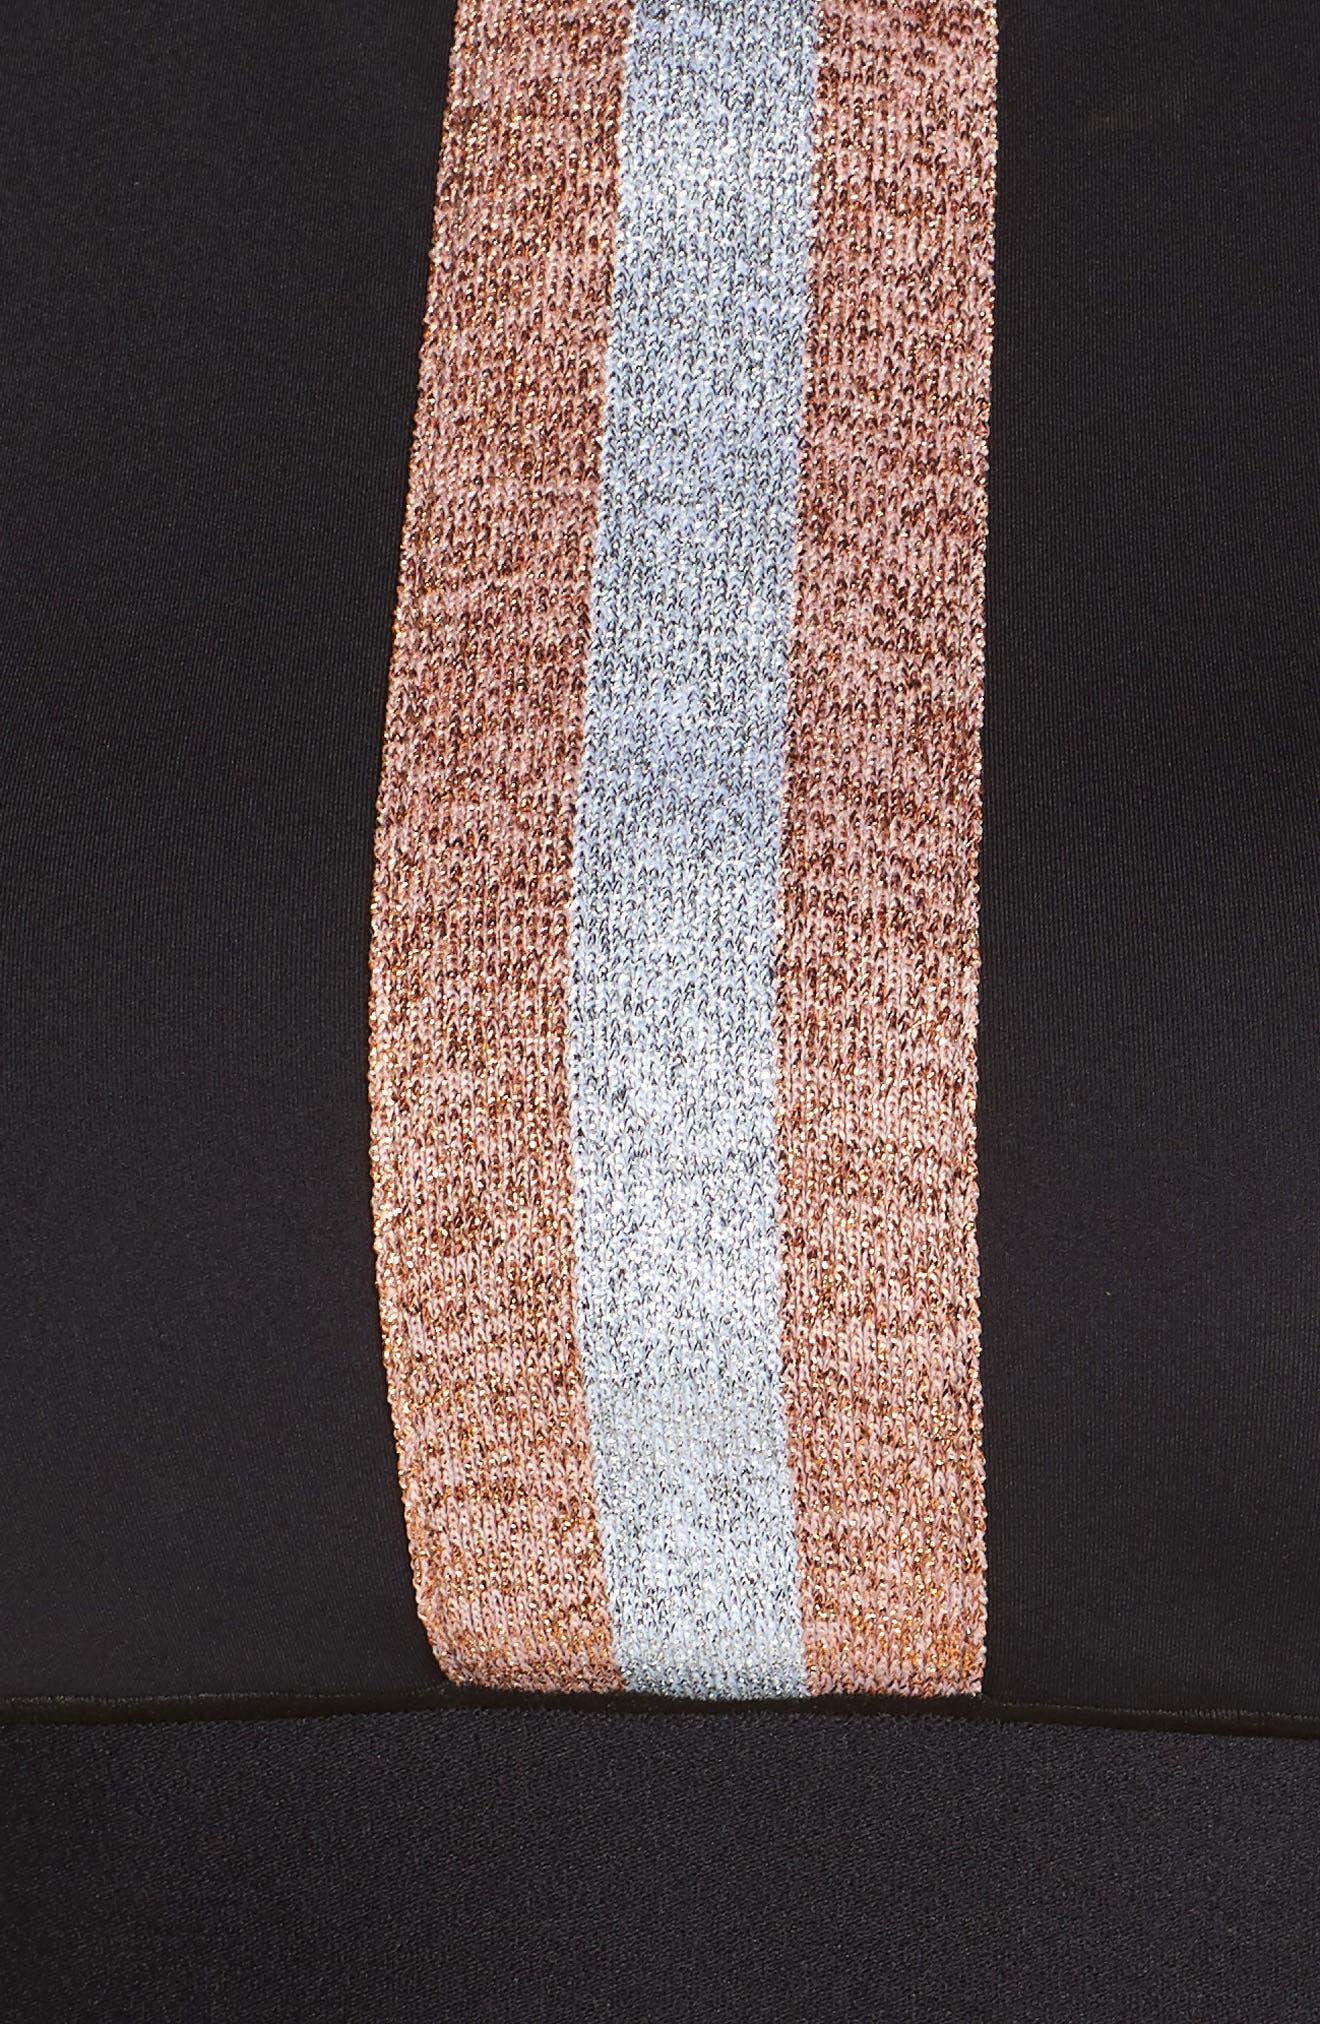 Level Matte Collegiate Crop Top,                             Alternate thumbnail 3, color,                             Nero Rose Silver